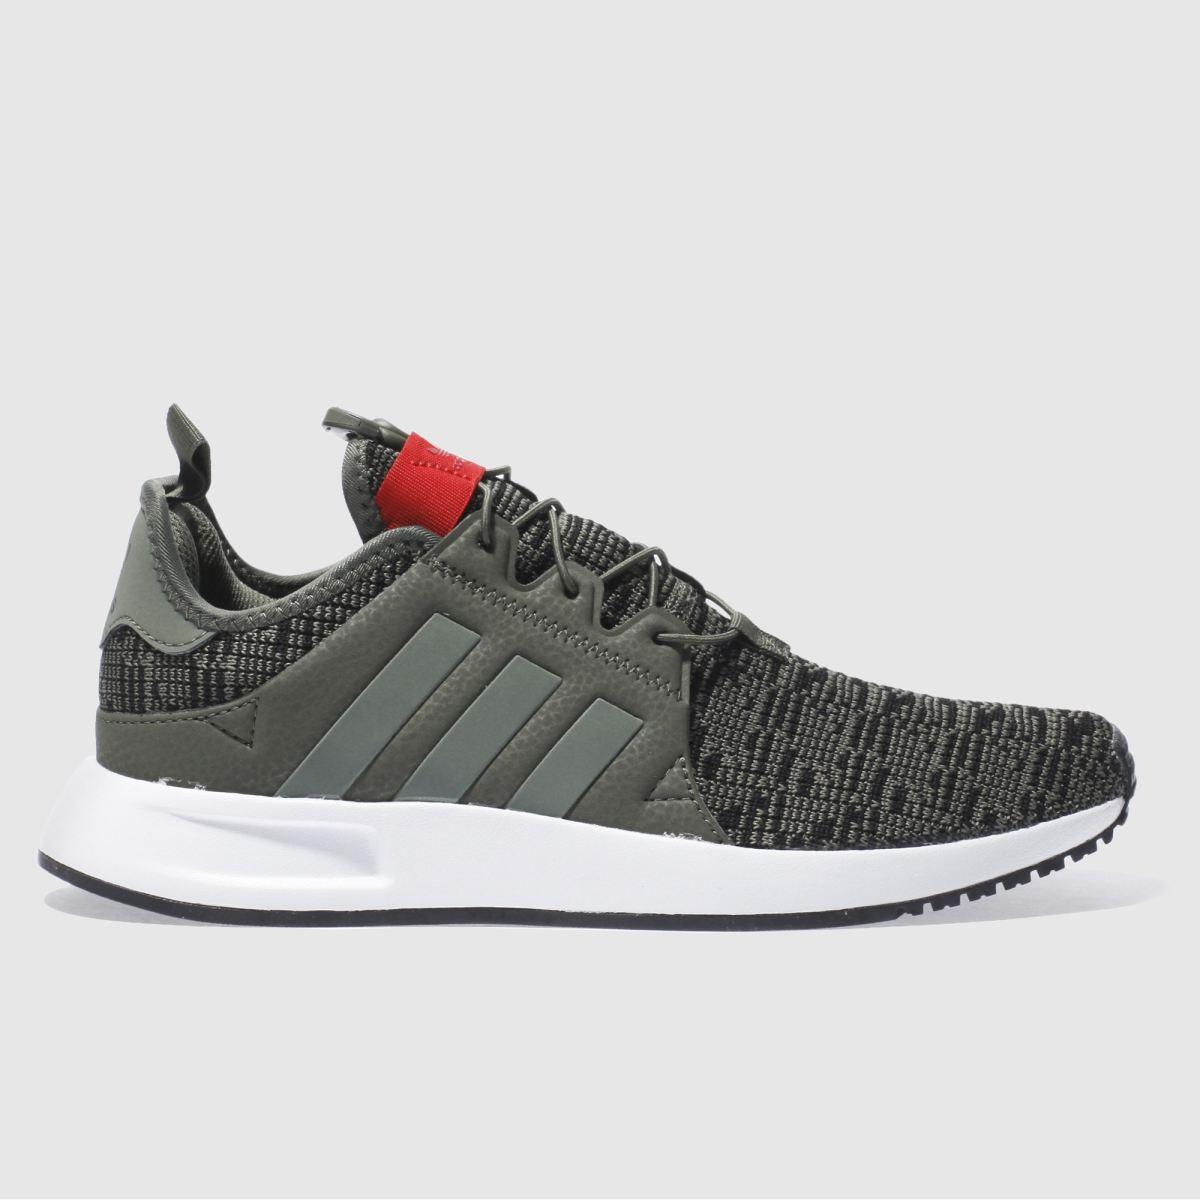 adidas khaki x_plr trainers